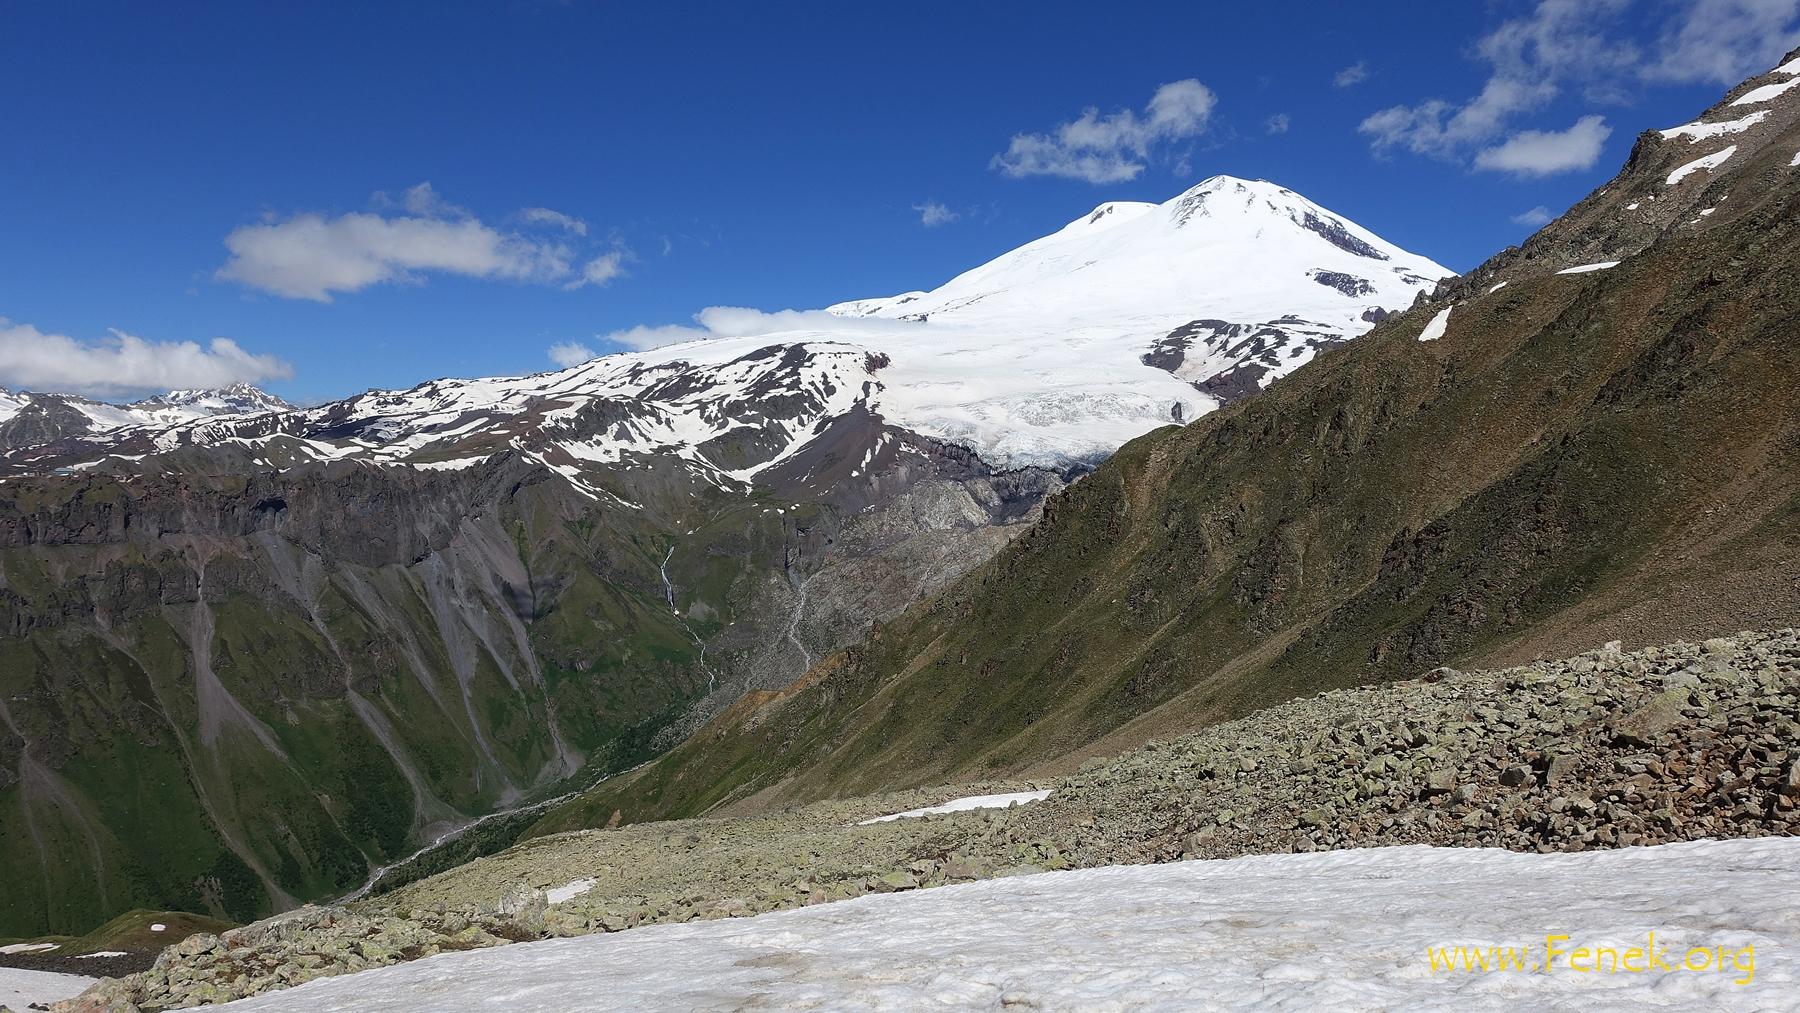 Blick zum Elbrus